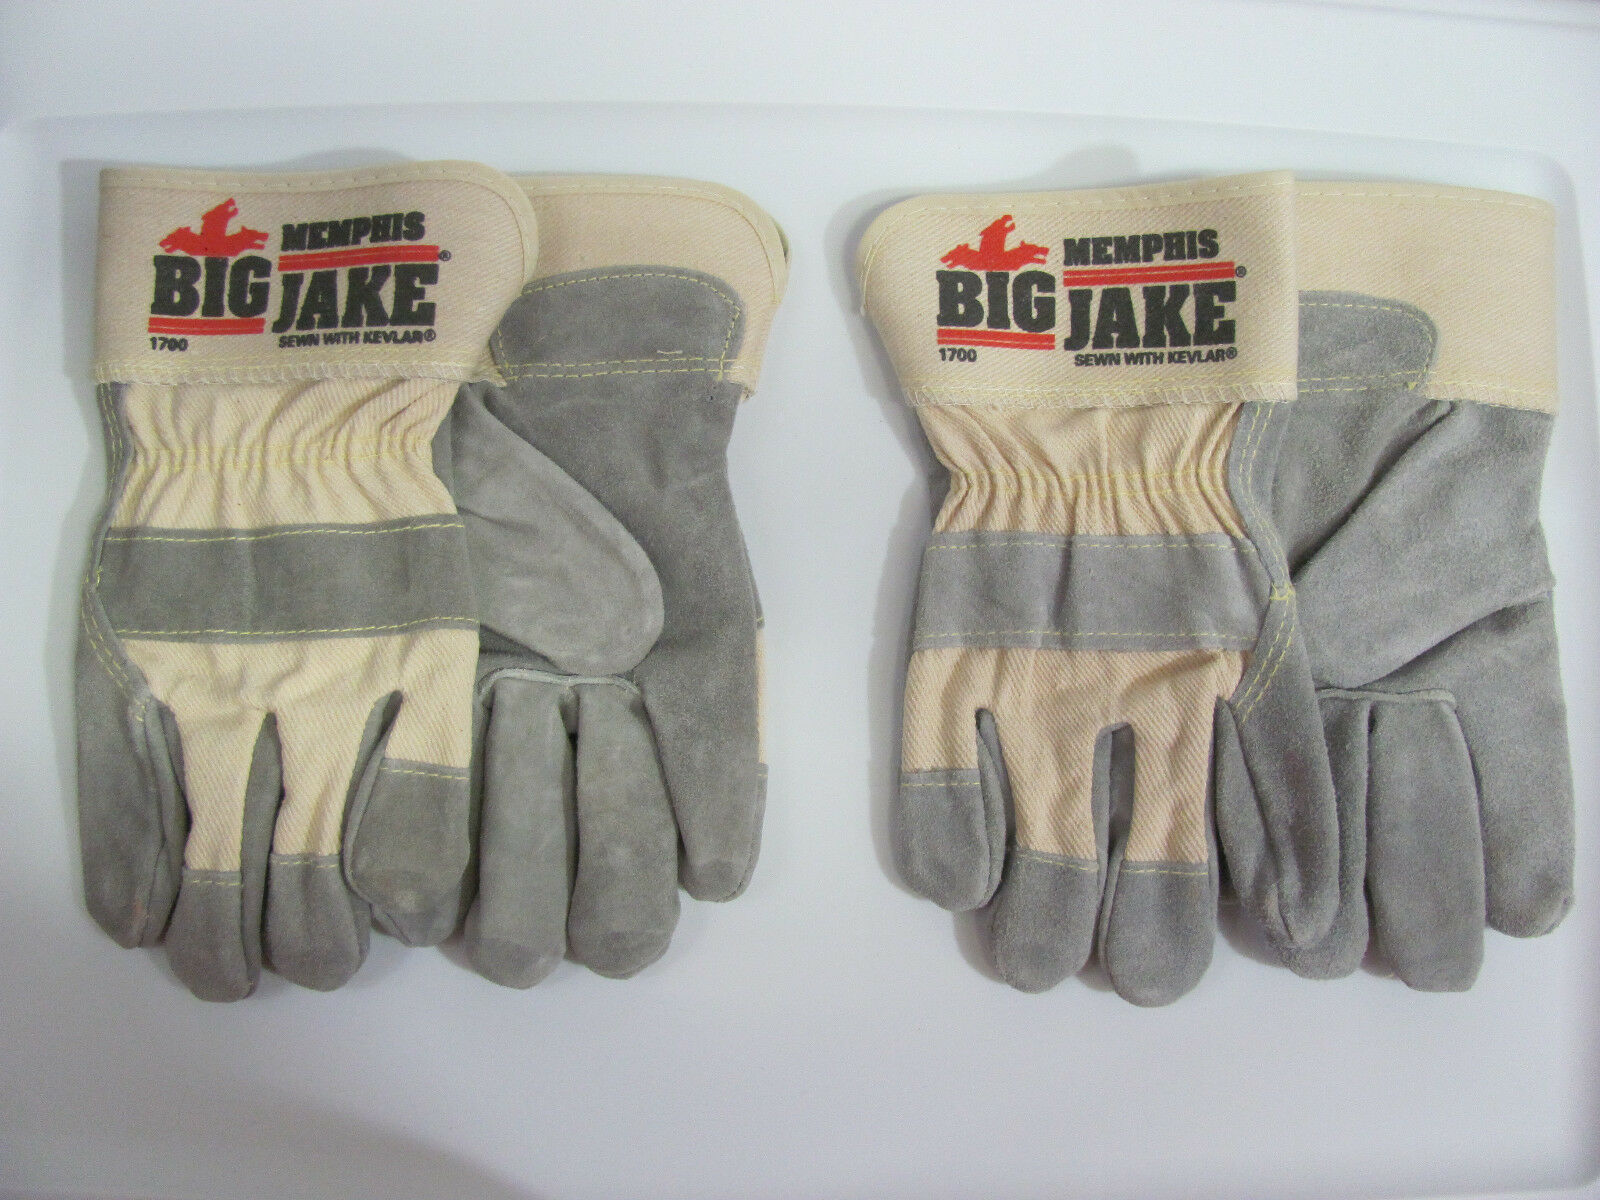 2 Pair Memphis 1700 Big Jake Leather Palm Work Gloves W DuPo